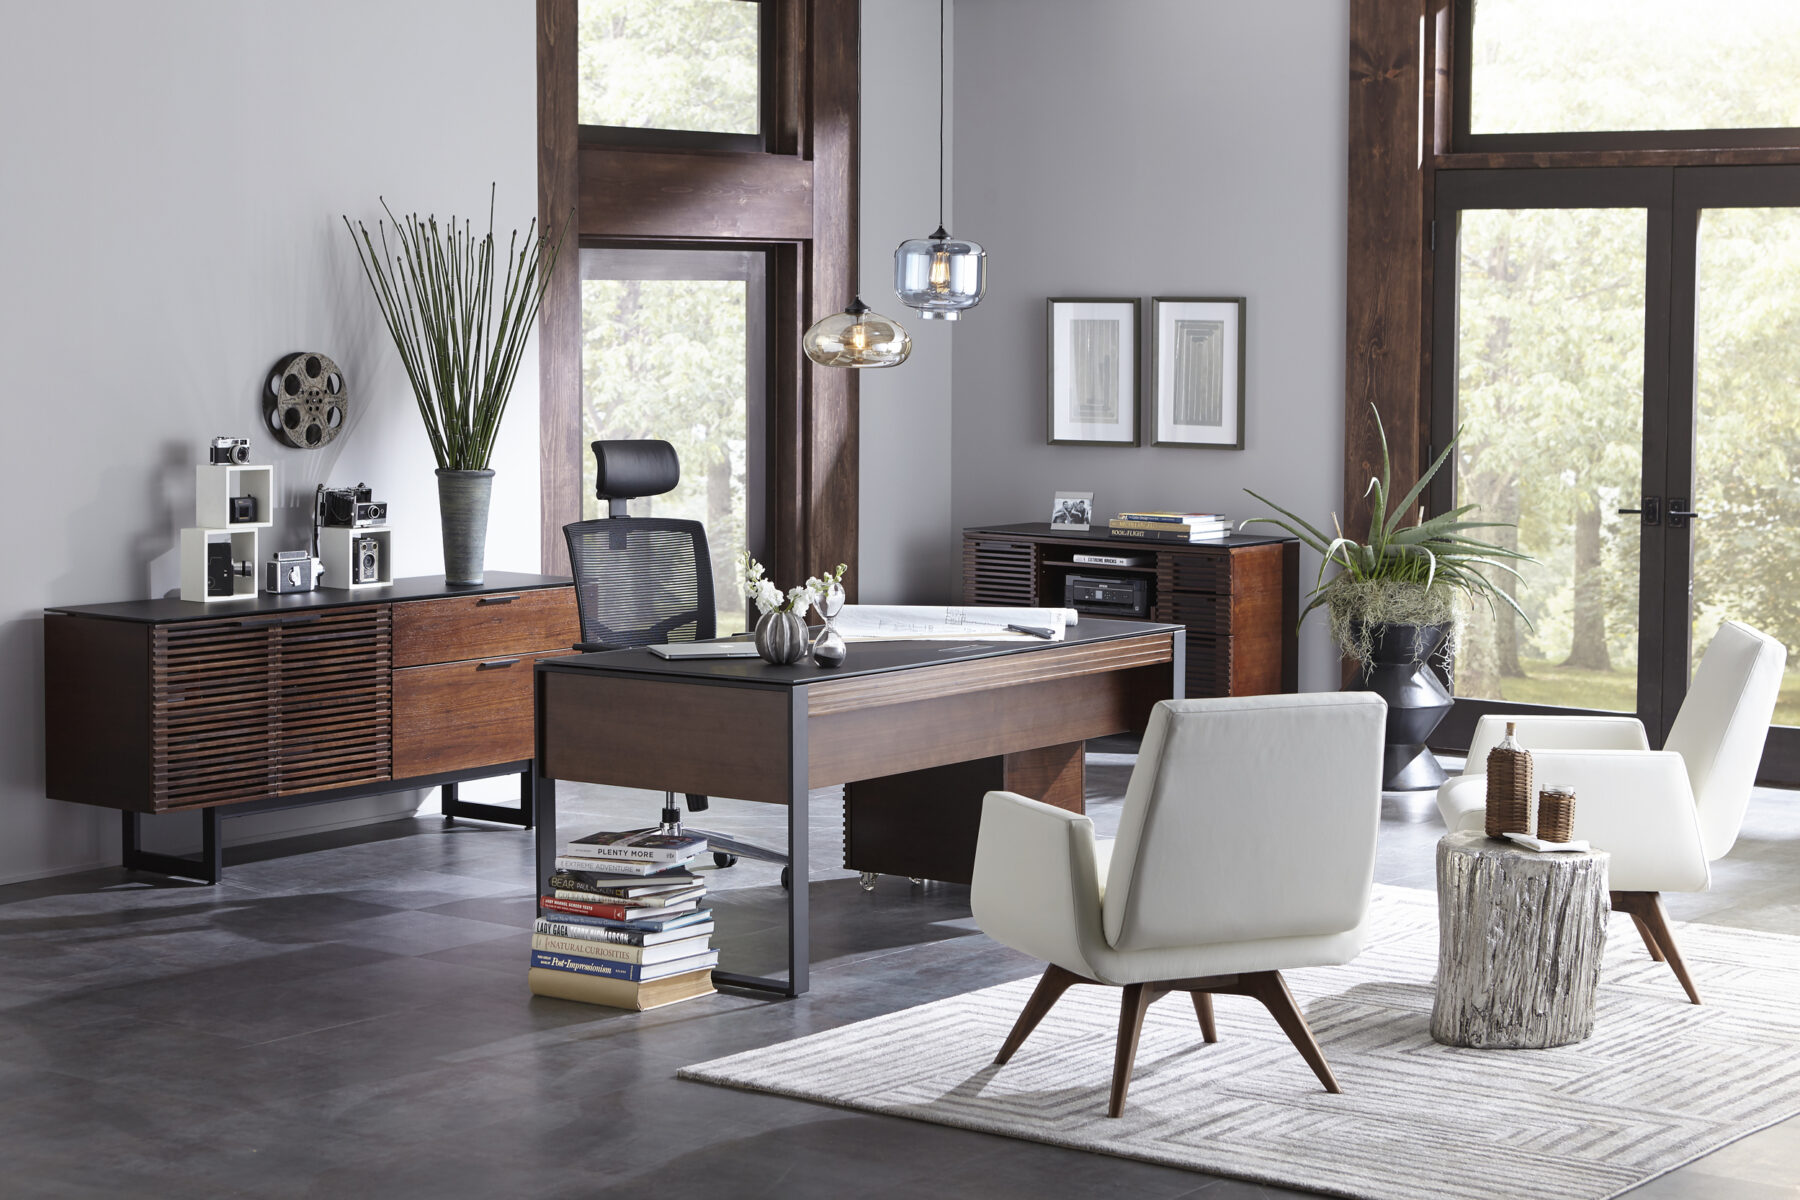 Corridor_Office_Furniture_BDI_0